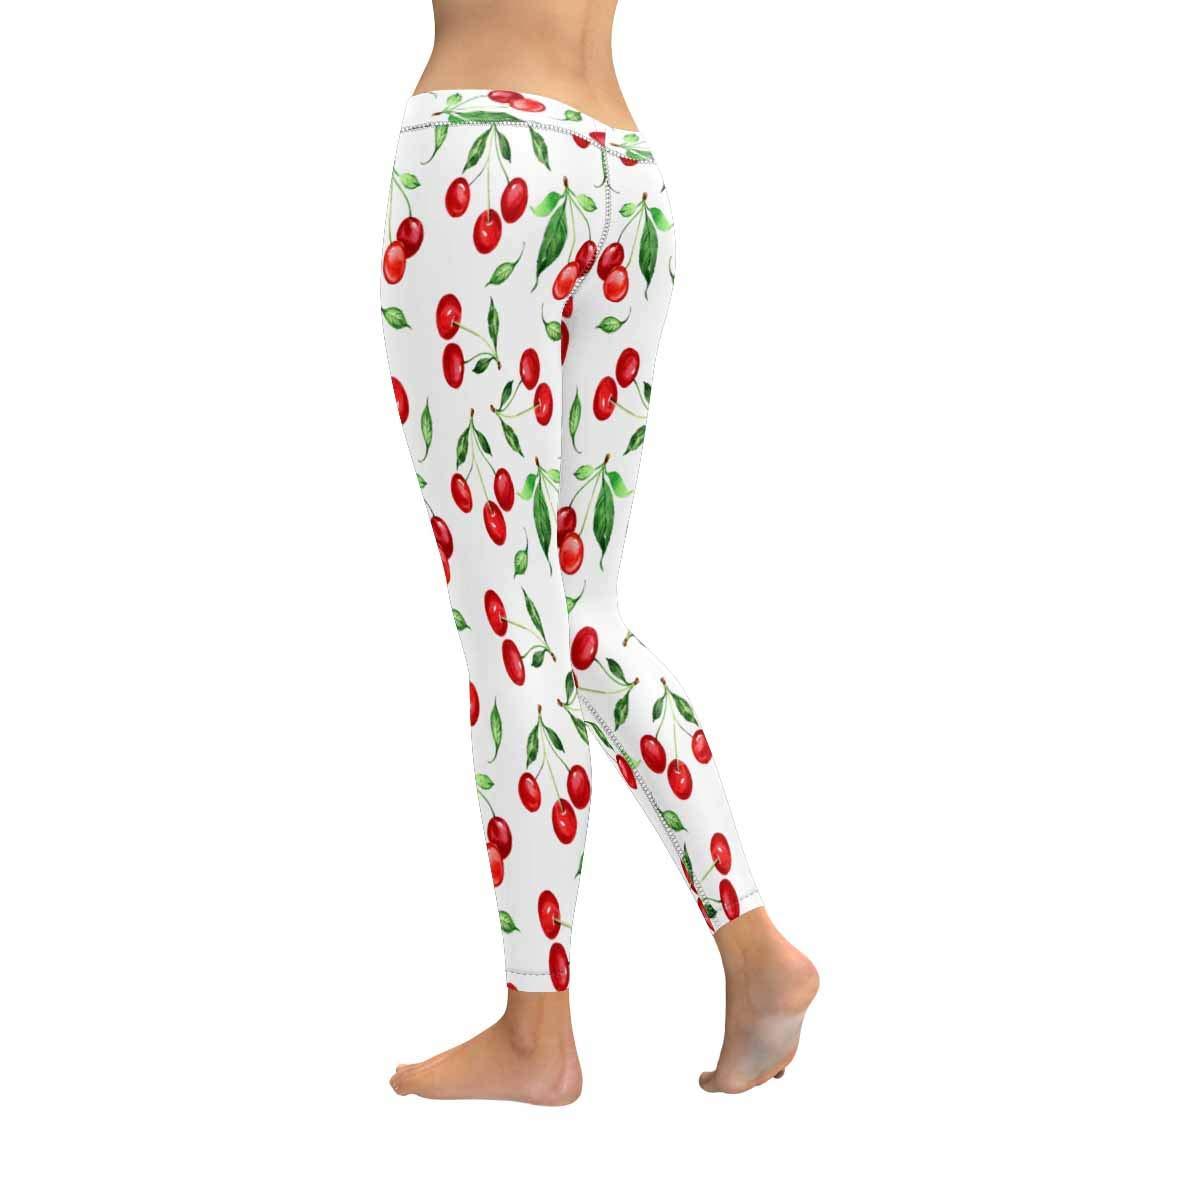 InterestPrint Womens Soft Slim Leggings Pattern Cherry Stretchy Active Leggings XXS-5XL